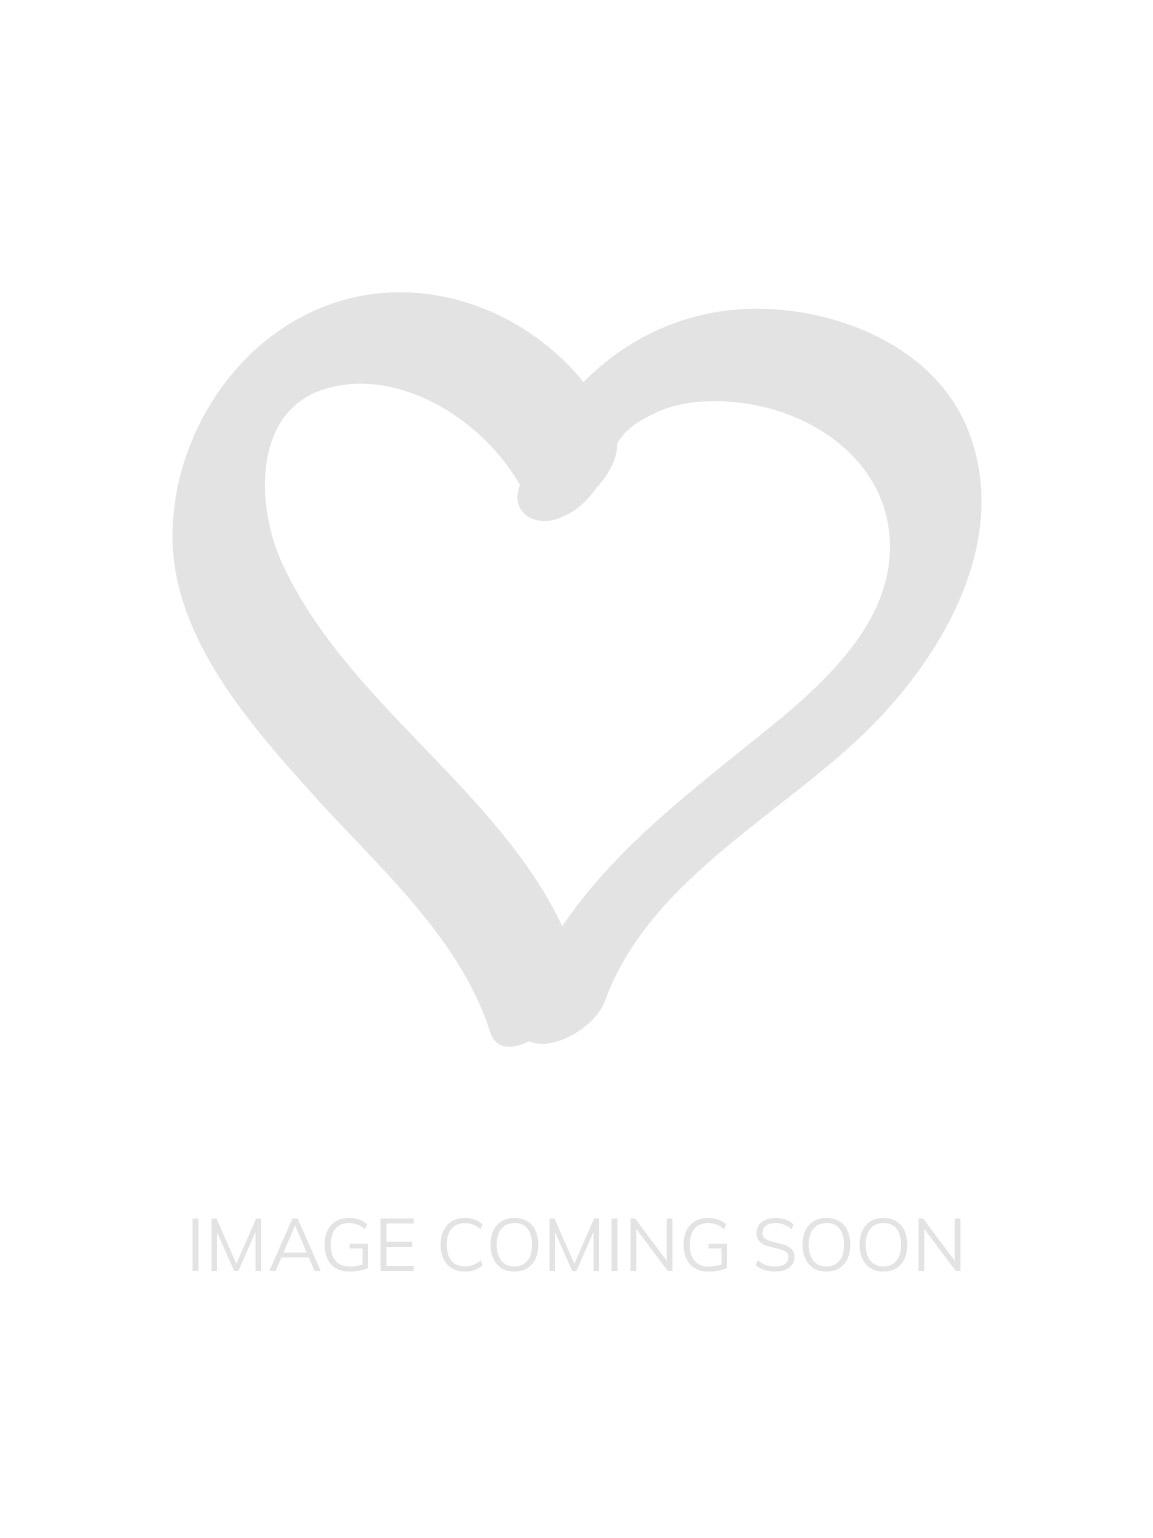 5e296f479c55 Yoko Deep Plunge Bra - Oyster